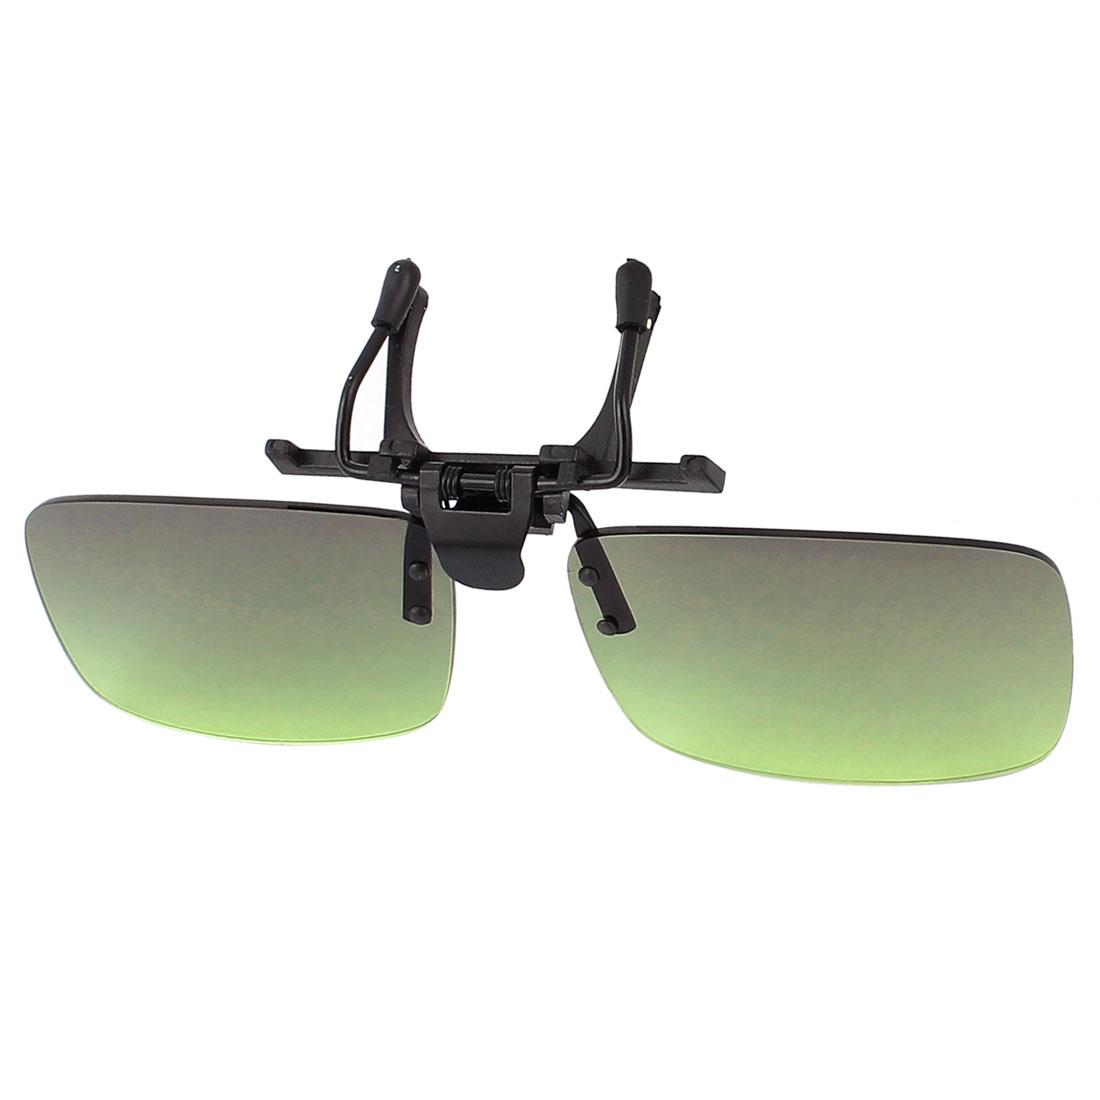 Green Lens Rimless Anti Glare Clip On Driving Sunglasses Eyeglasses 122 x 33mm